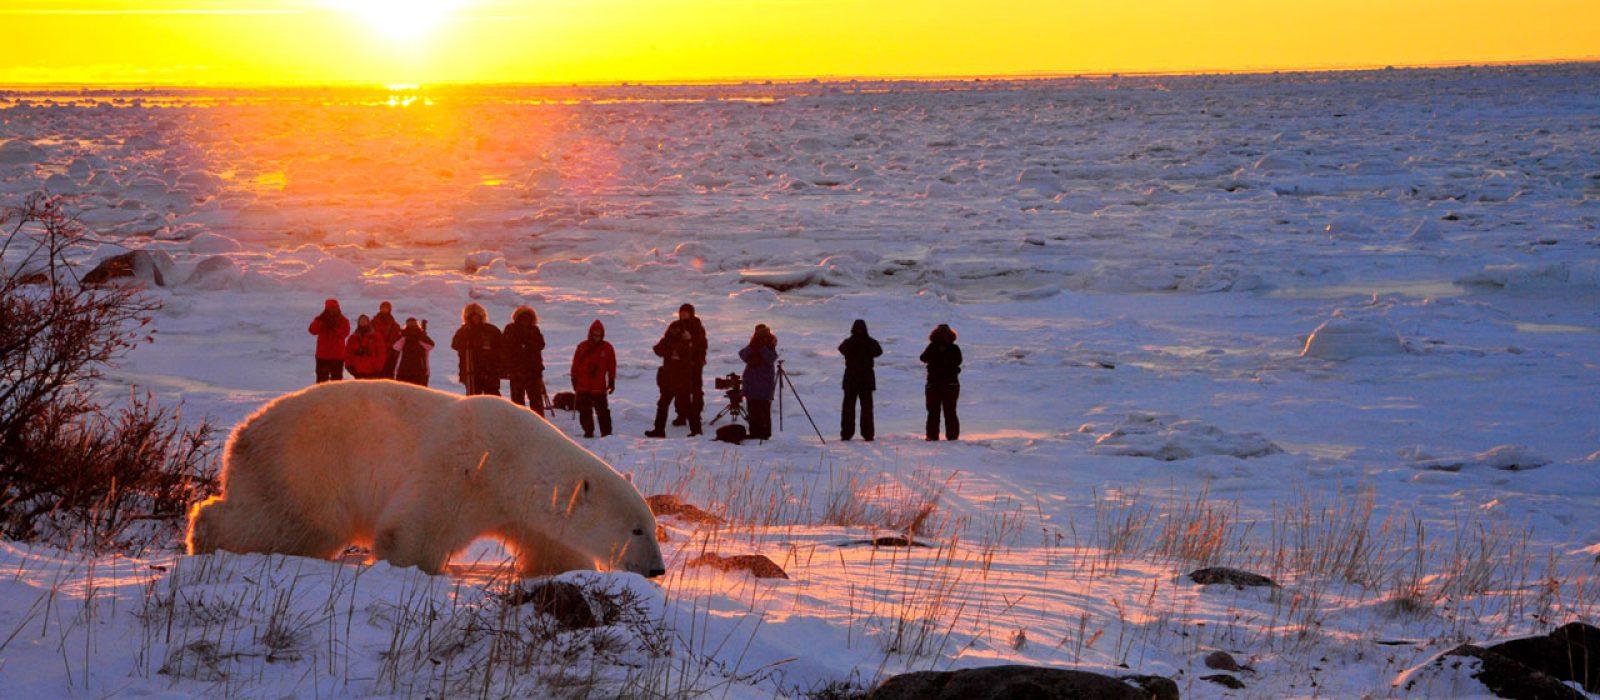 Photographing a polar bear at sunset, Churchill Wild, Manitoba